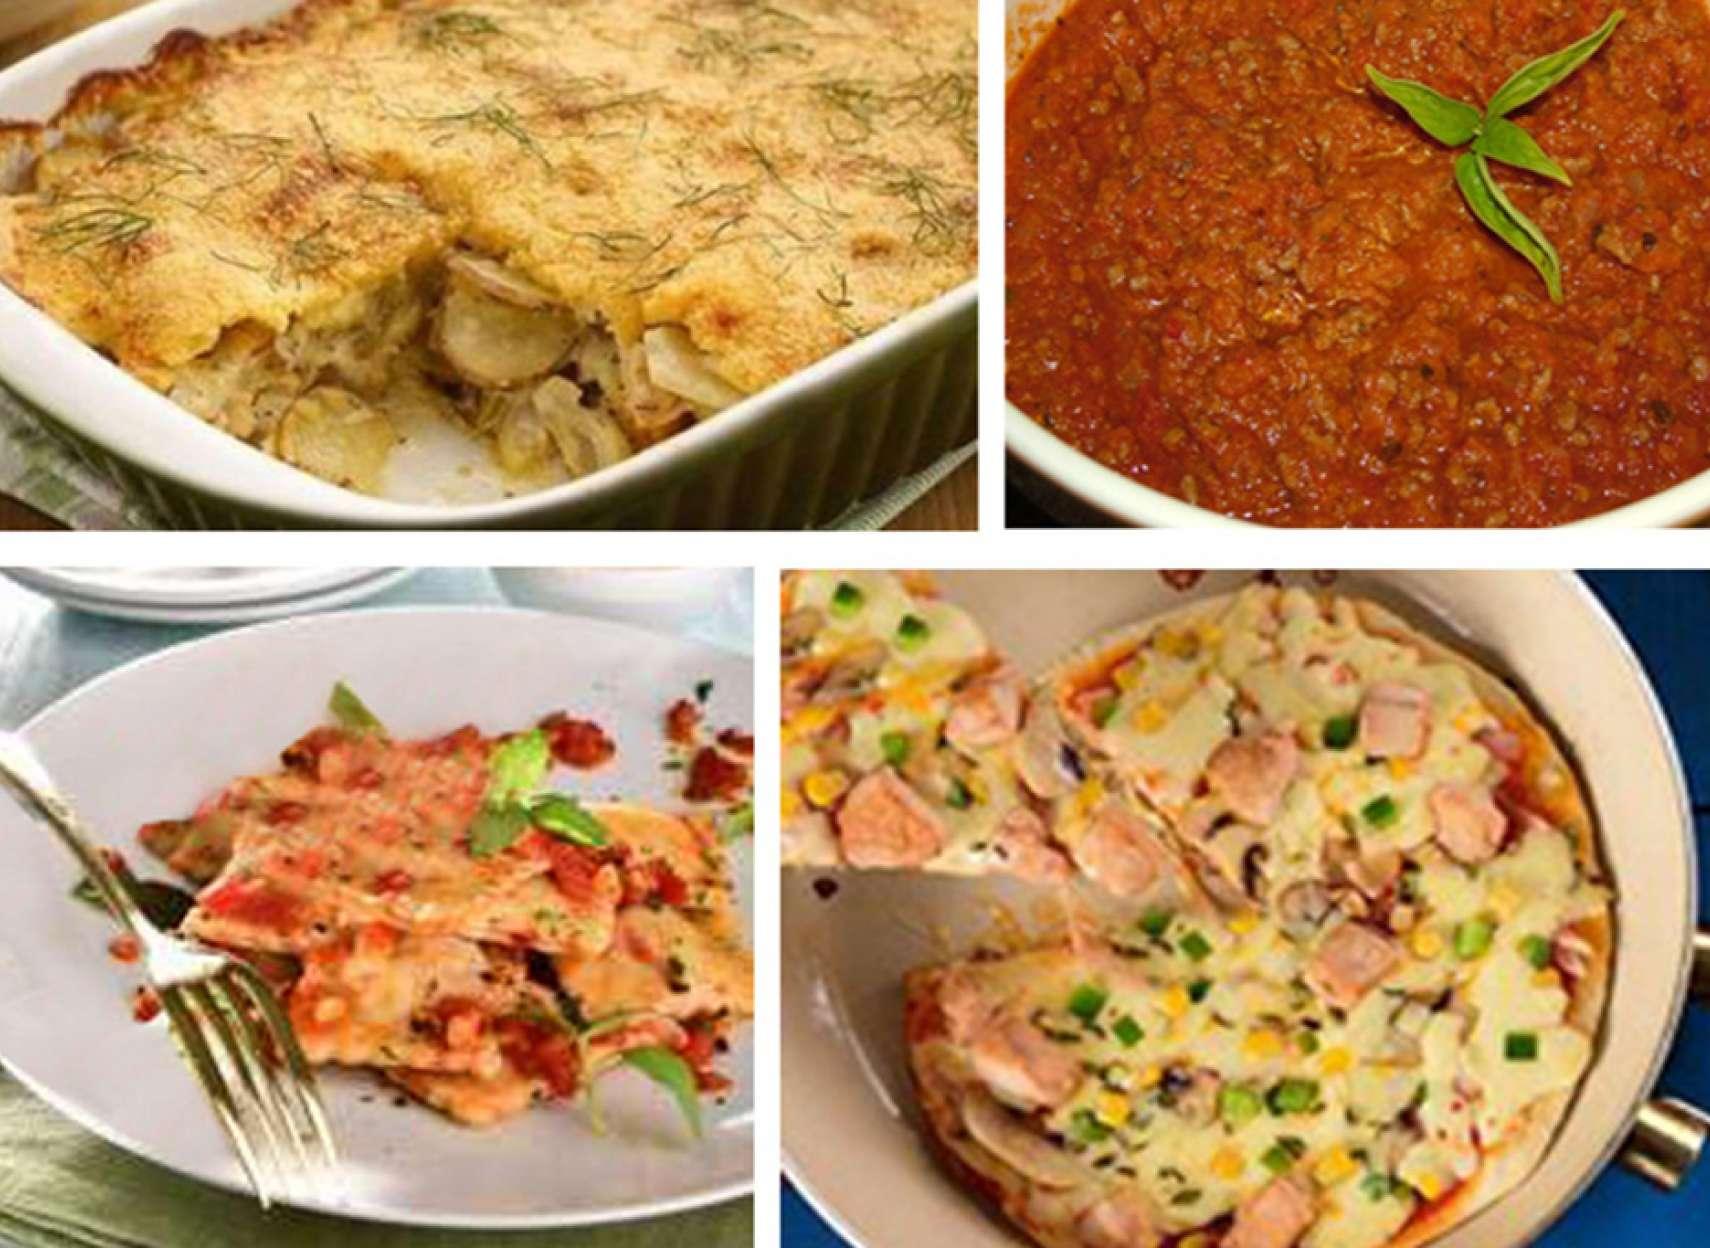 ashpazi-parvin-chiken-pizza-pan